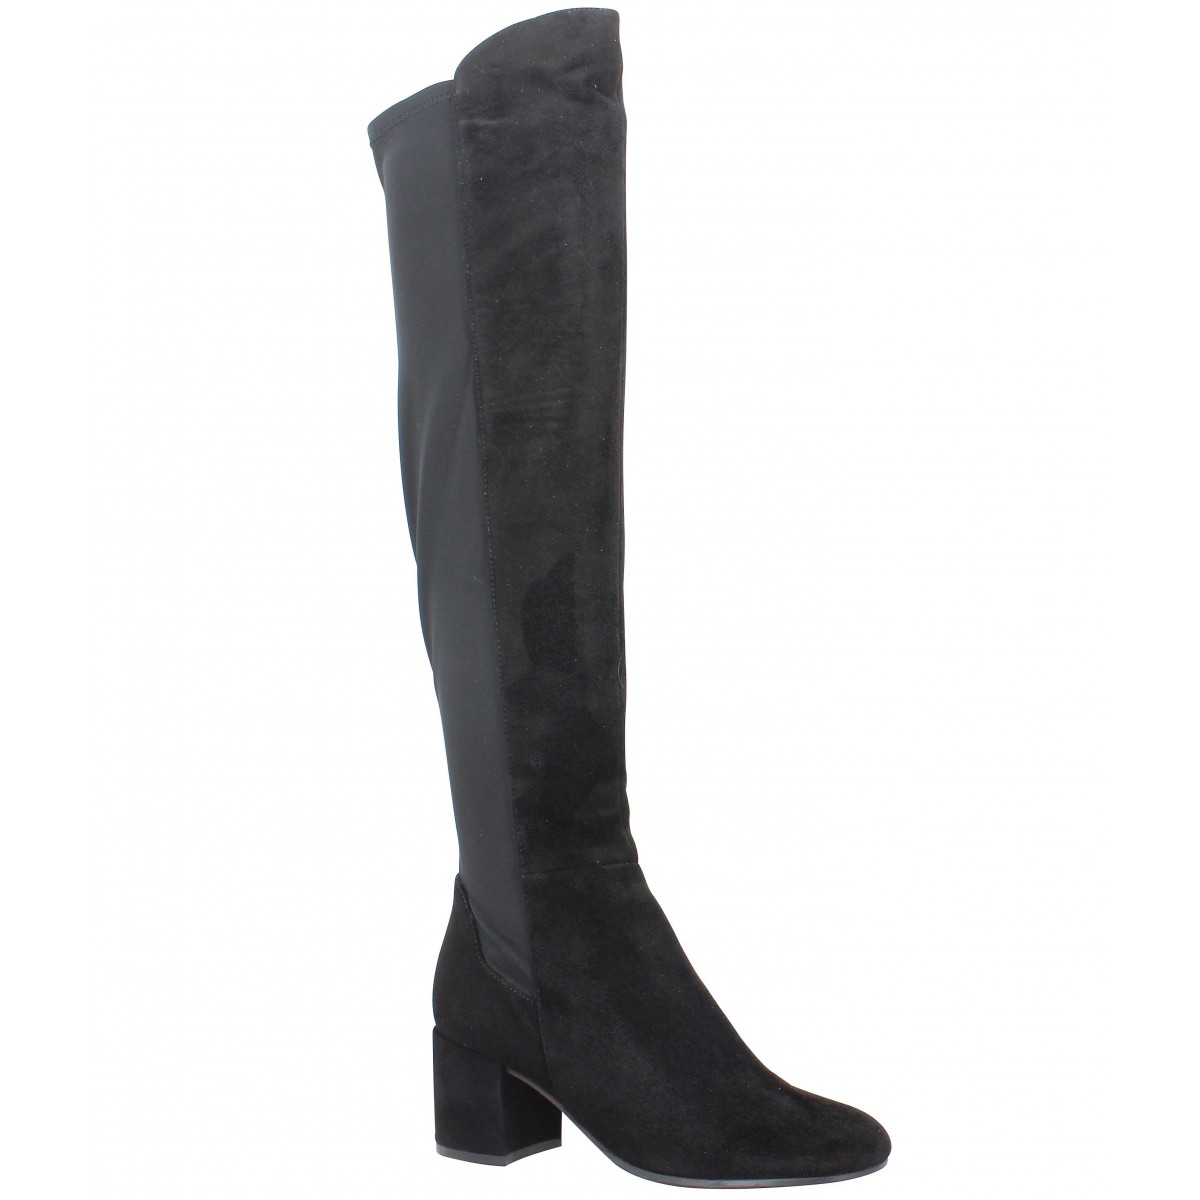 adele dezotti 303 velours femme noir femme fanny chaussures. Black Bedroom Furniture Sets. Home Design Ideas